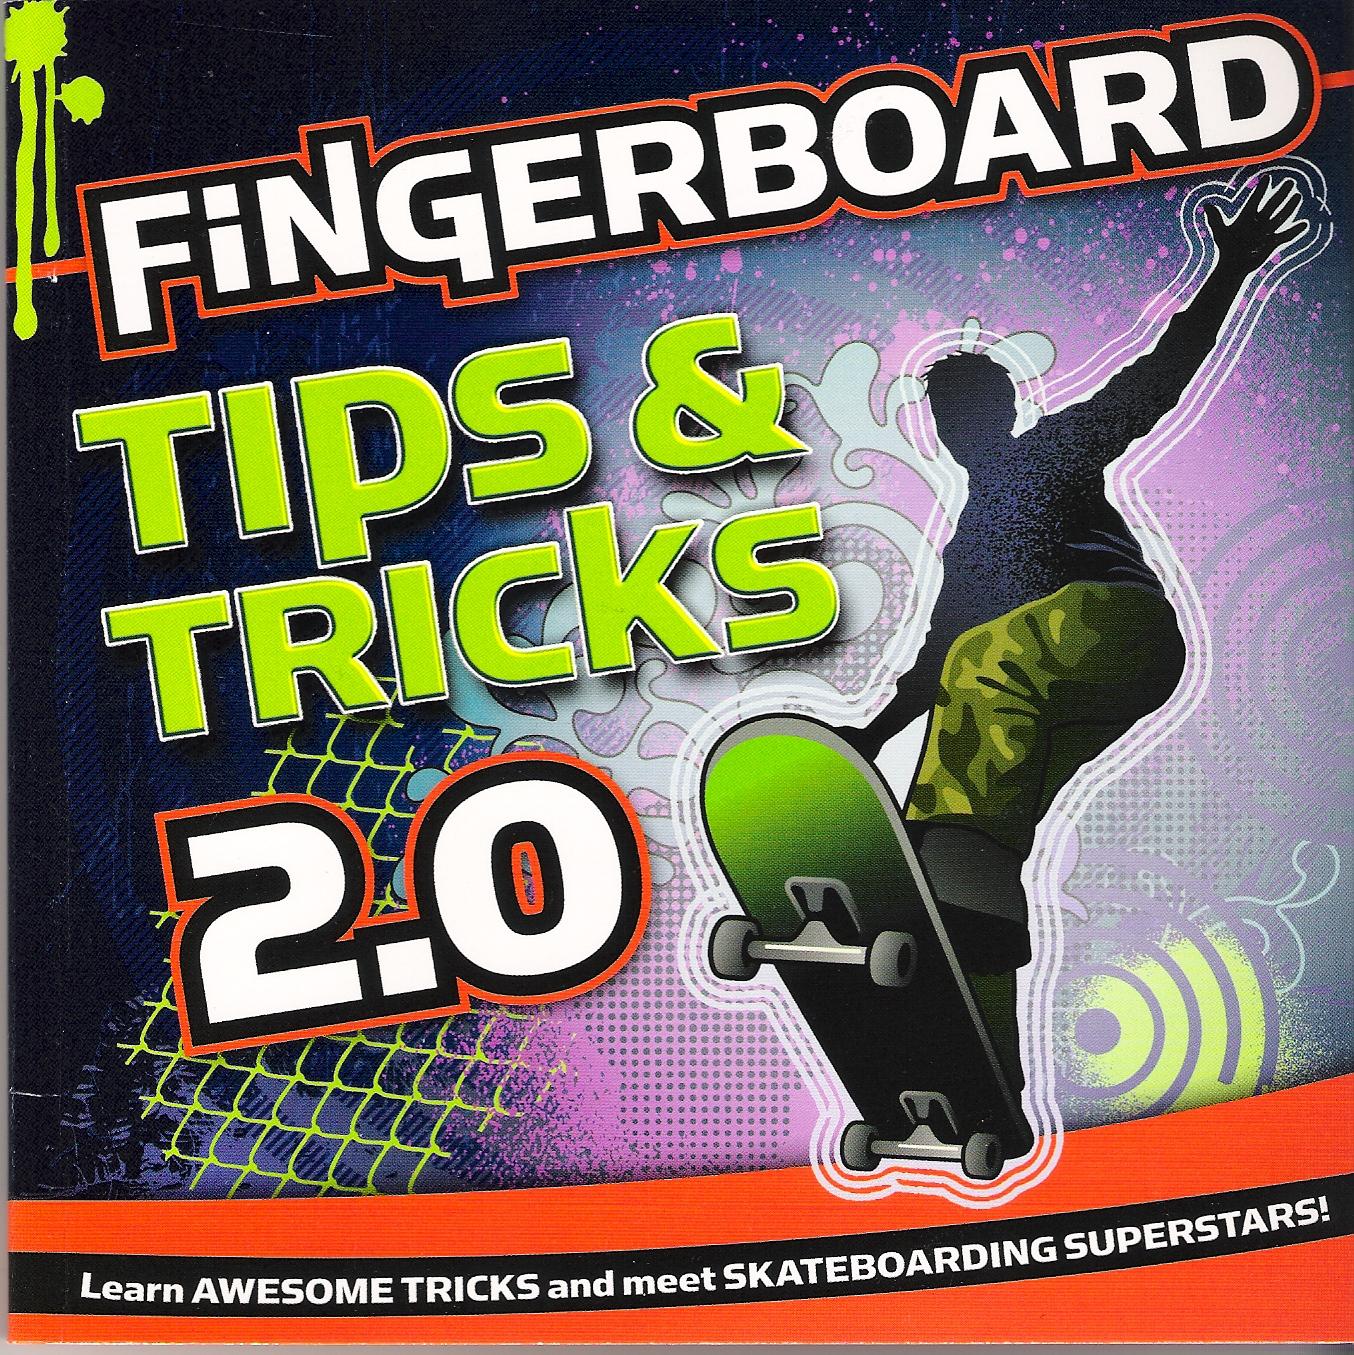 Fingerboard Cover copy.jpg